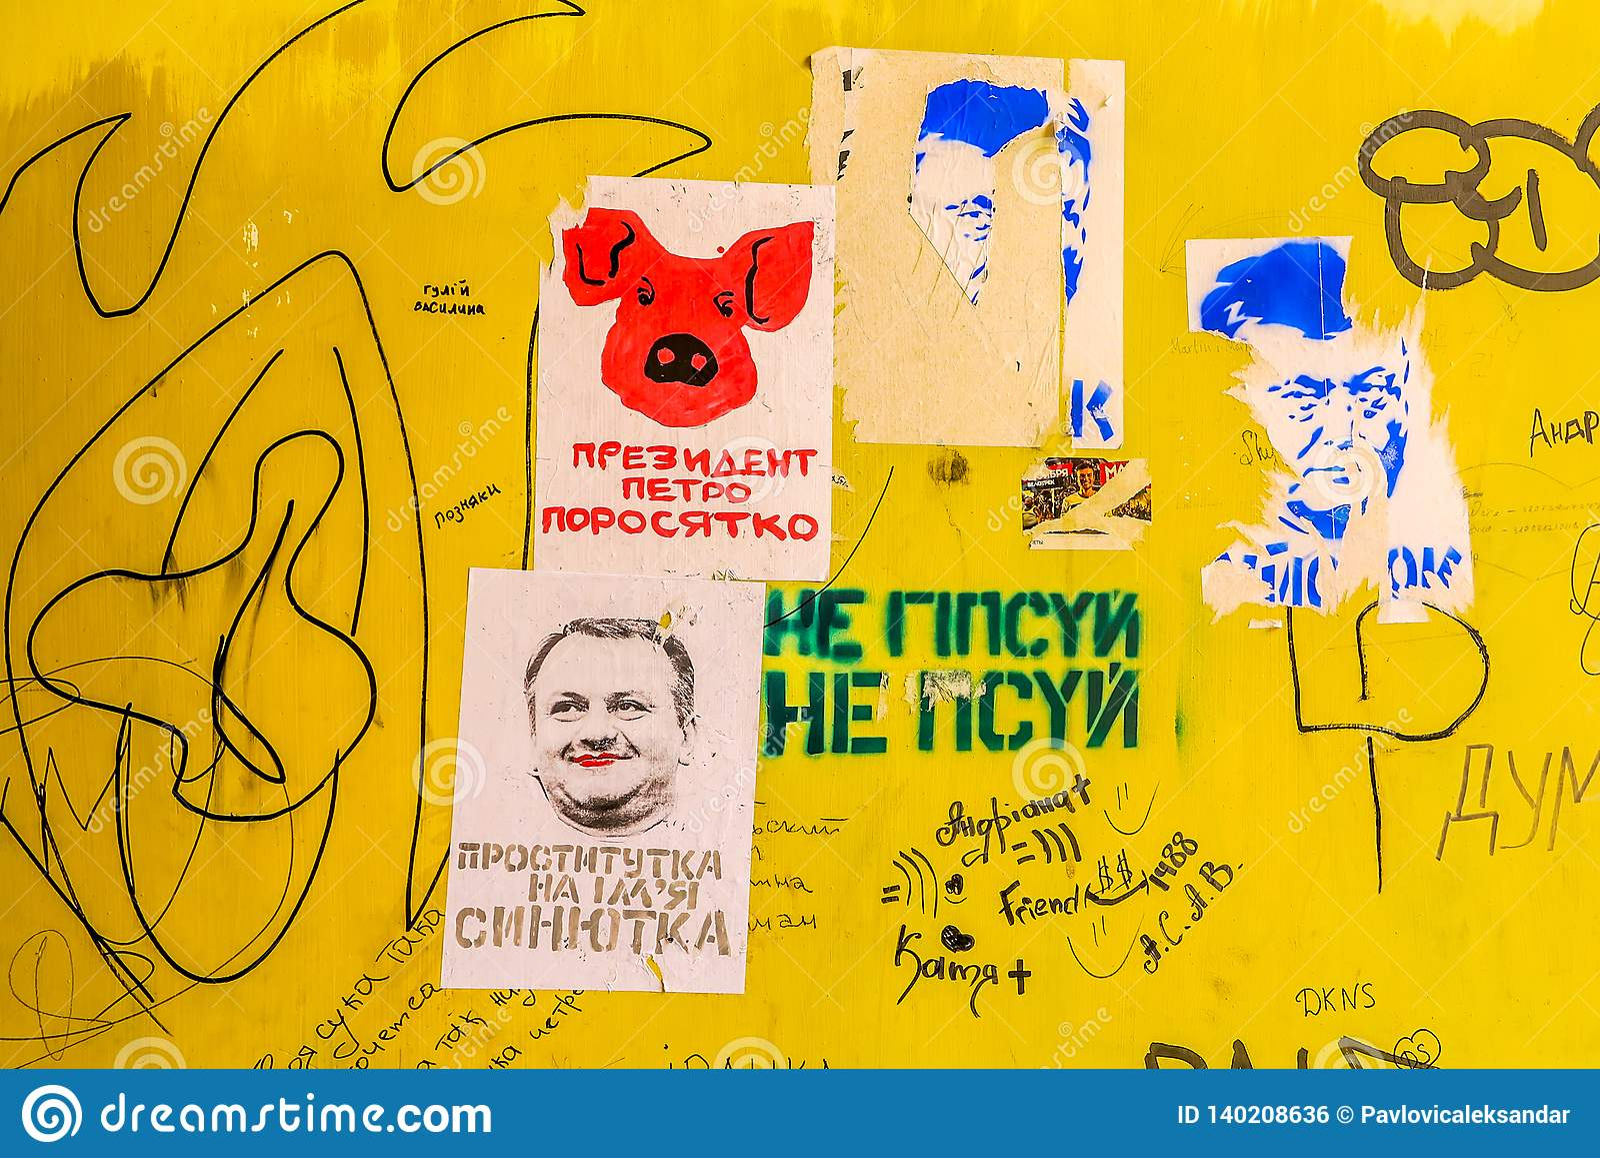 Lviv Ukraine Elections Editorial Photo Image Of Curses 140208636